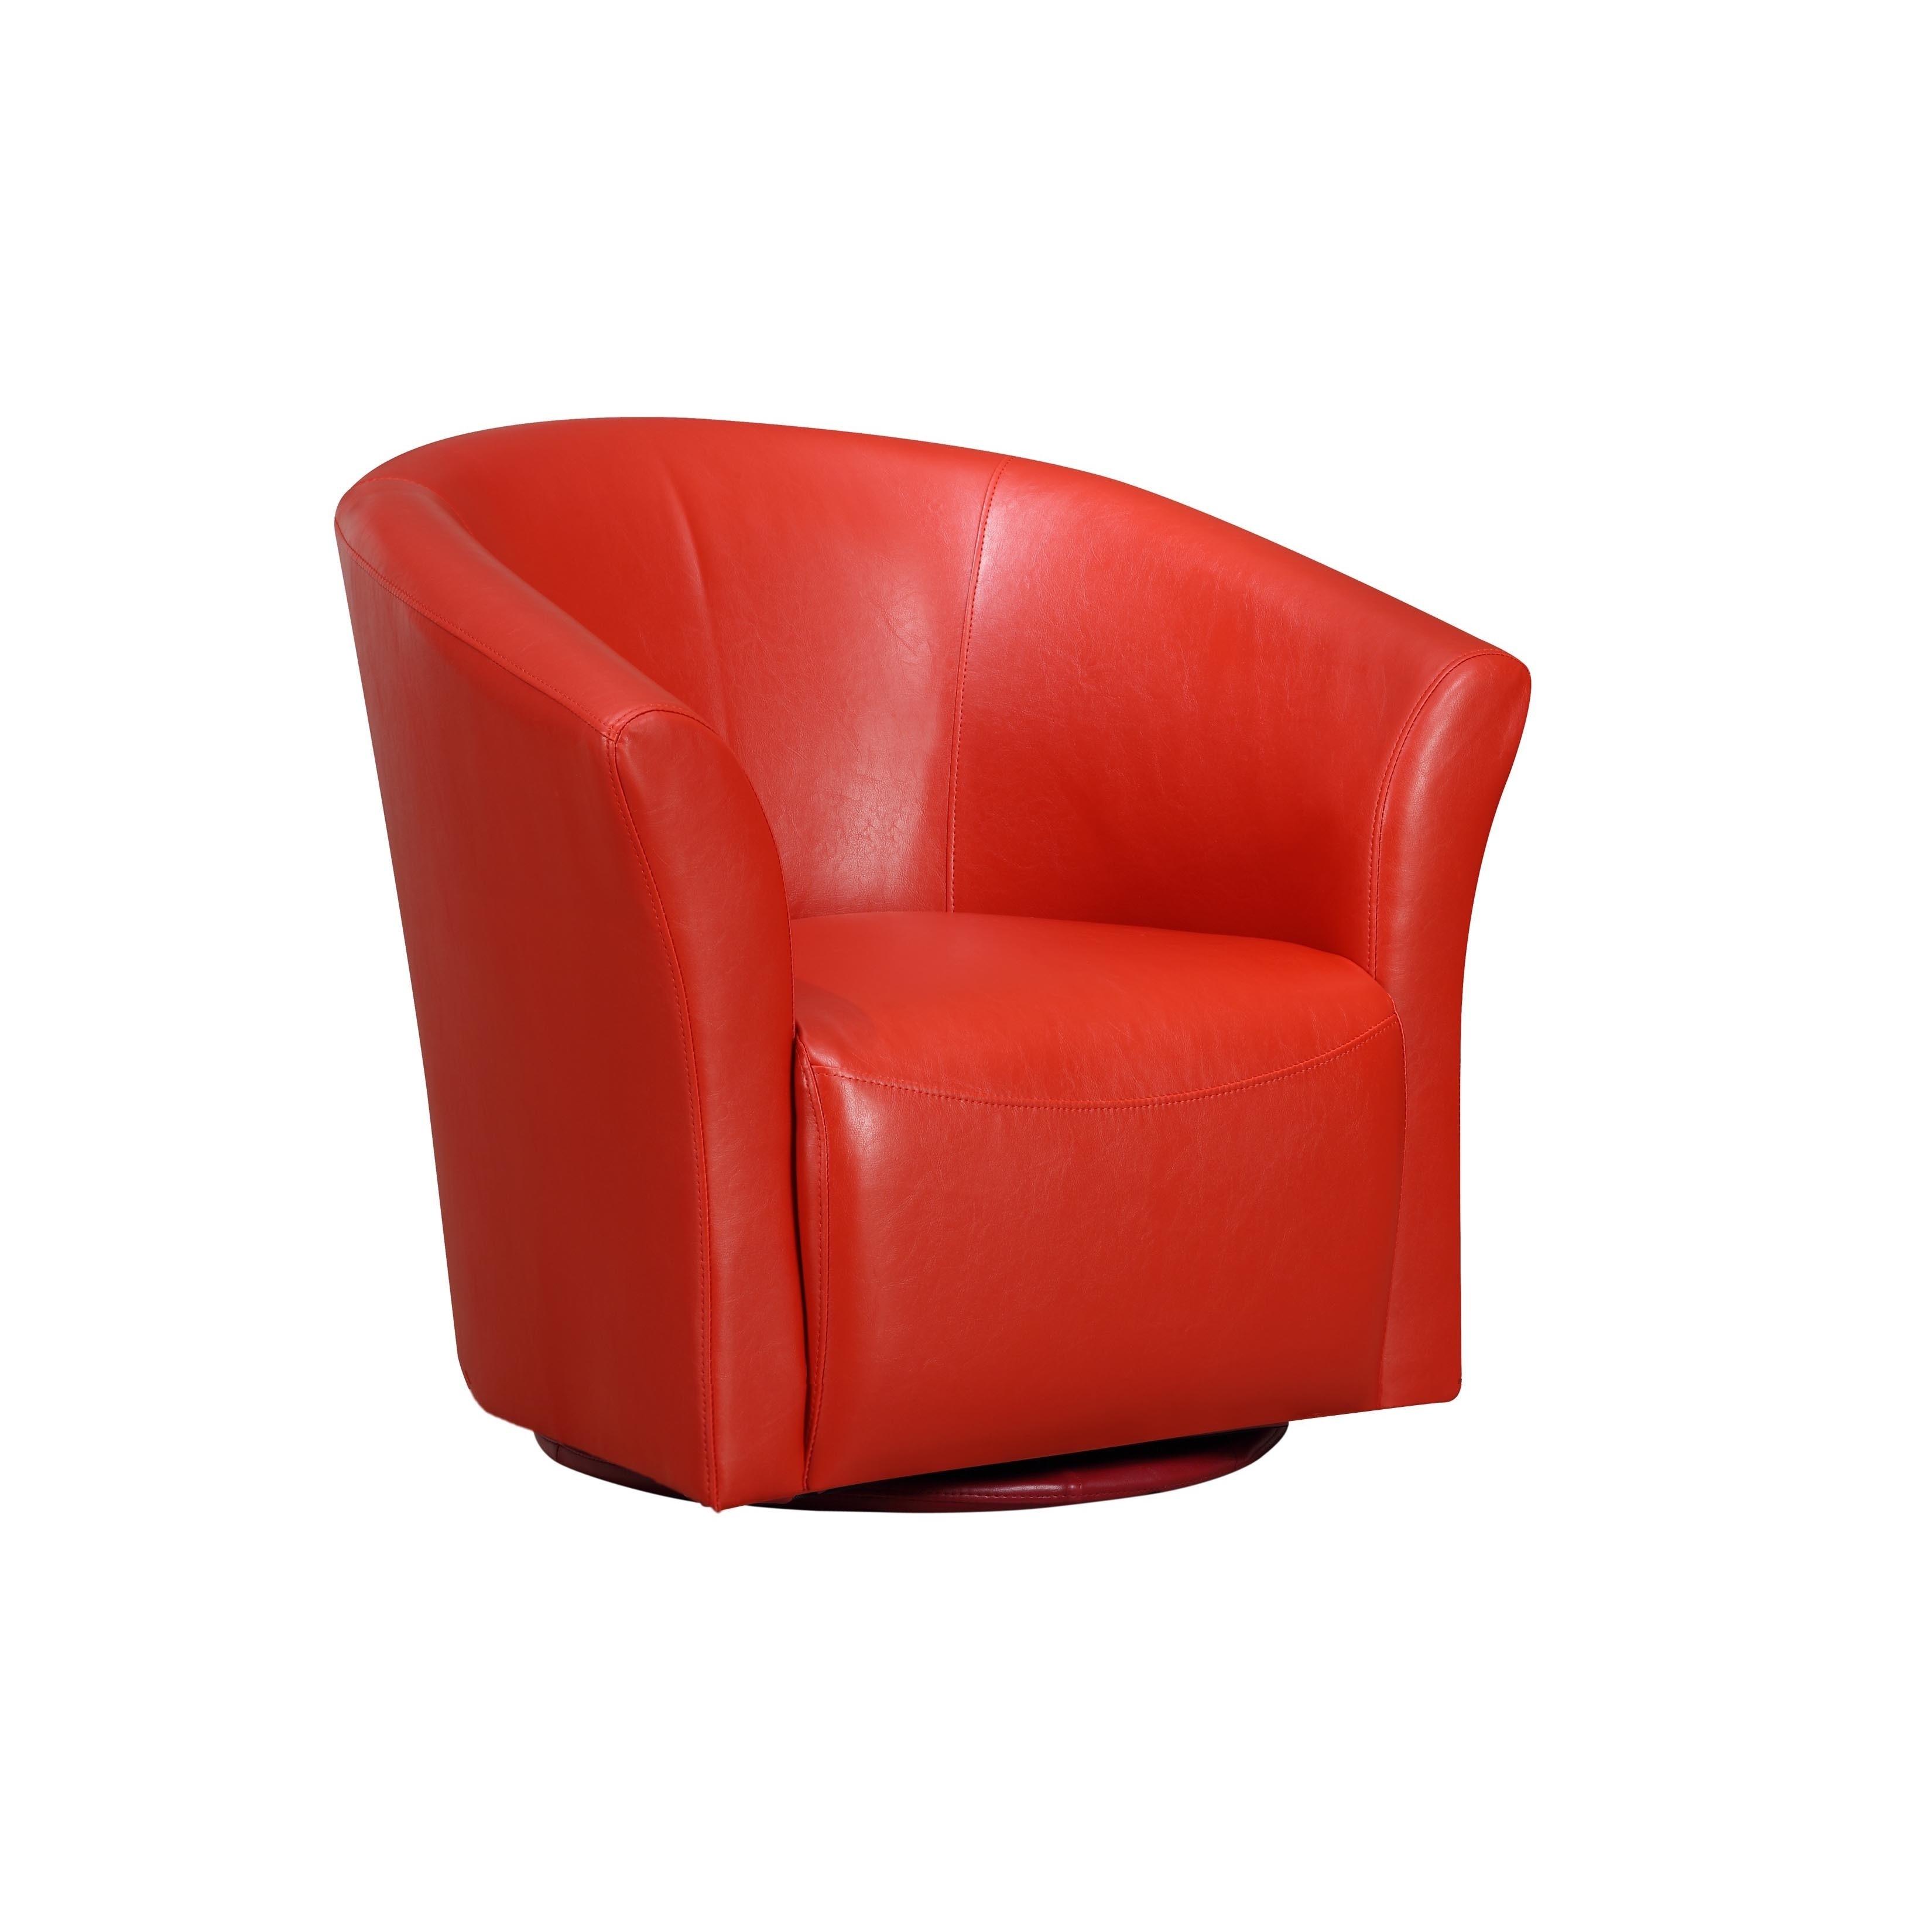 Picket House Radford Swivel Chair Riviera 6273 Red (Swive...